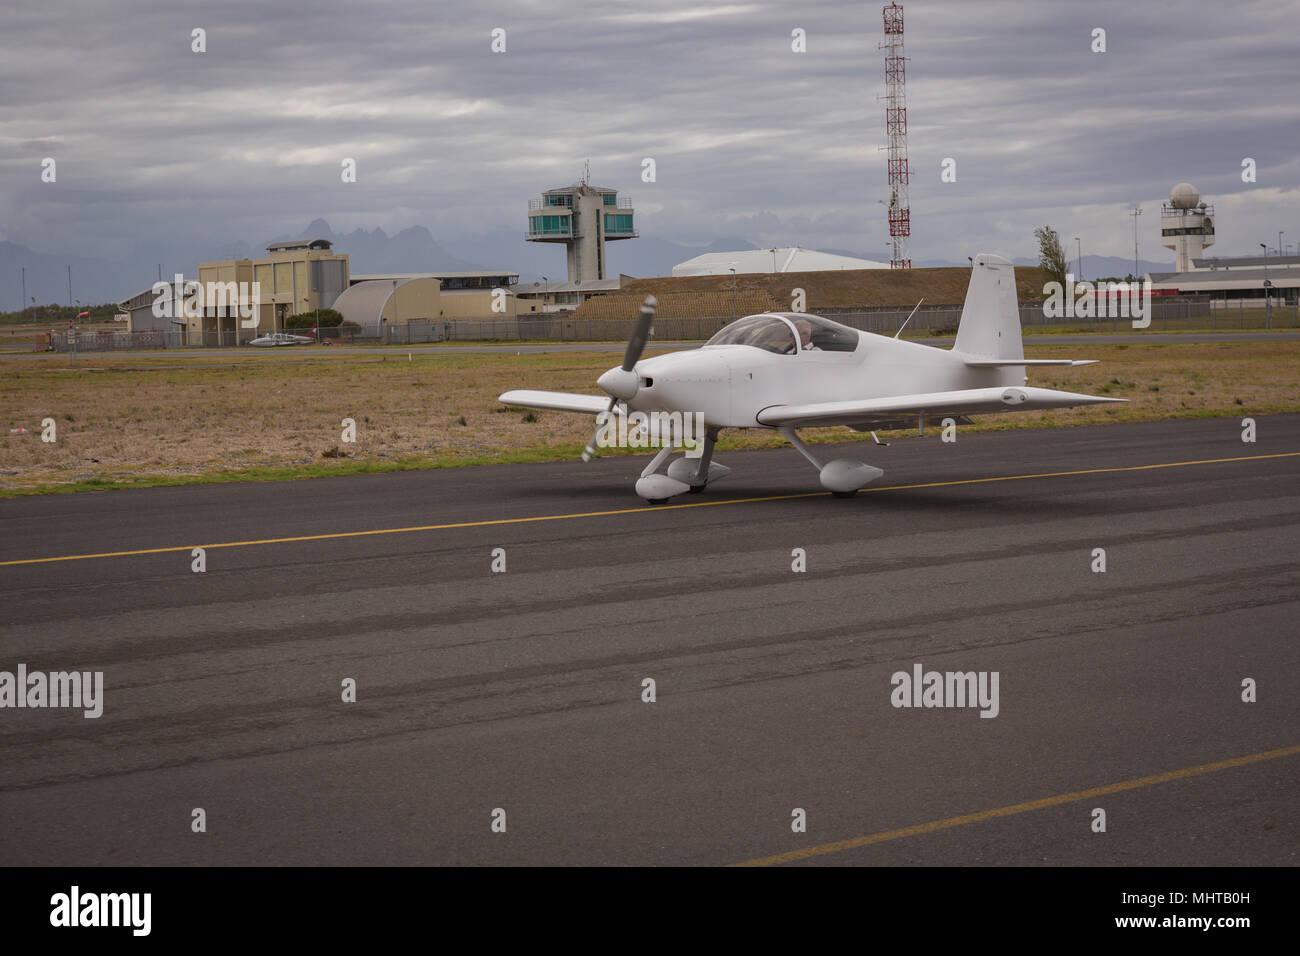 Aircraft taxiing on runway - Stock Image